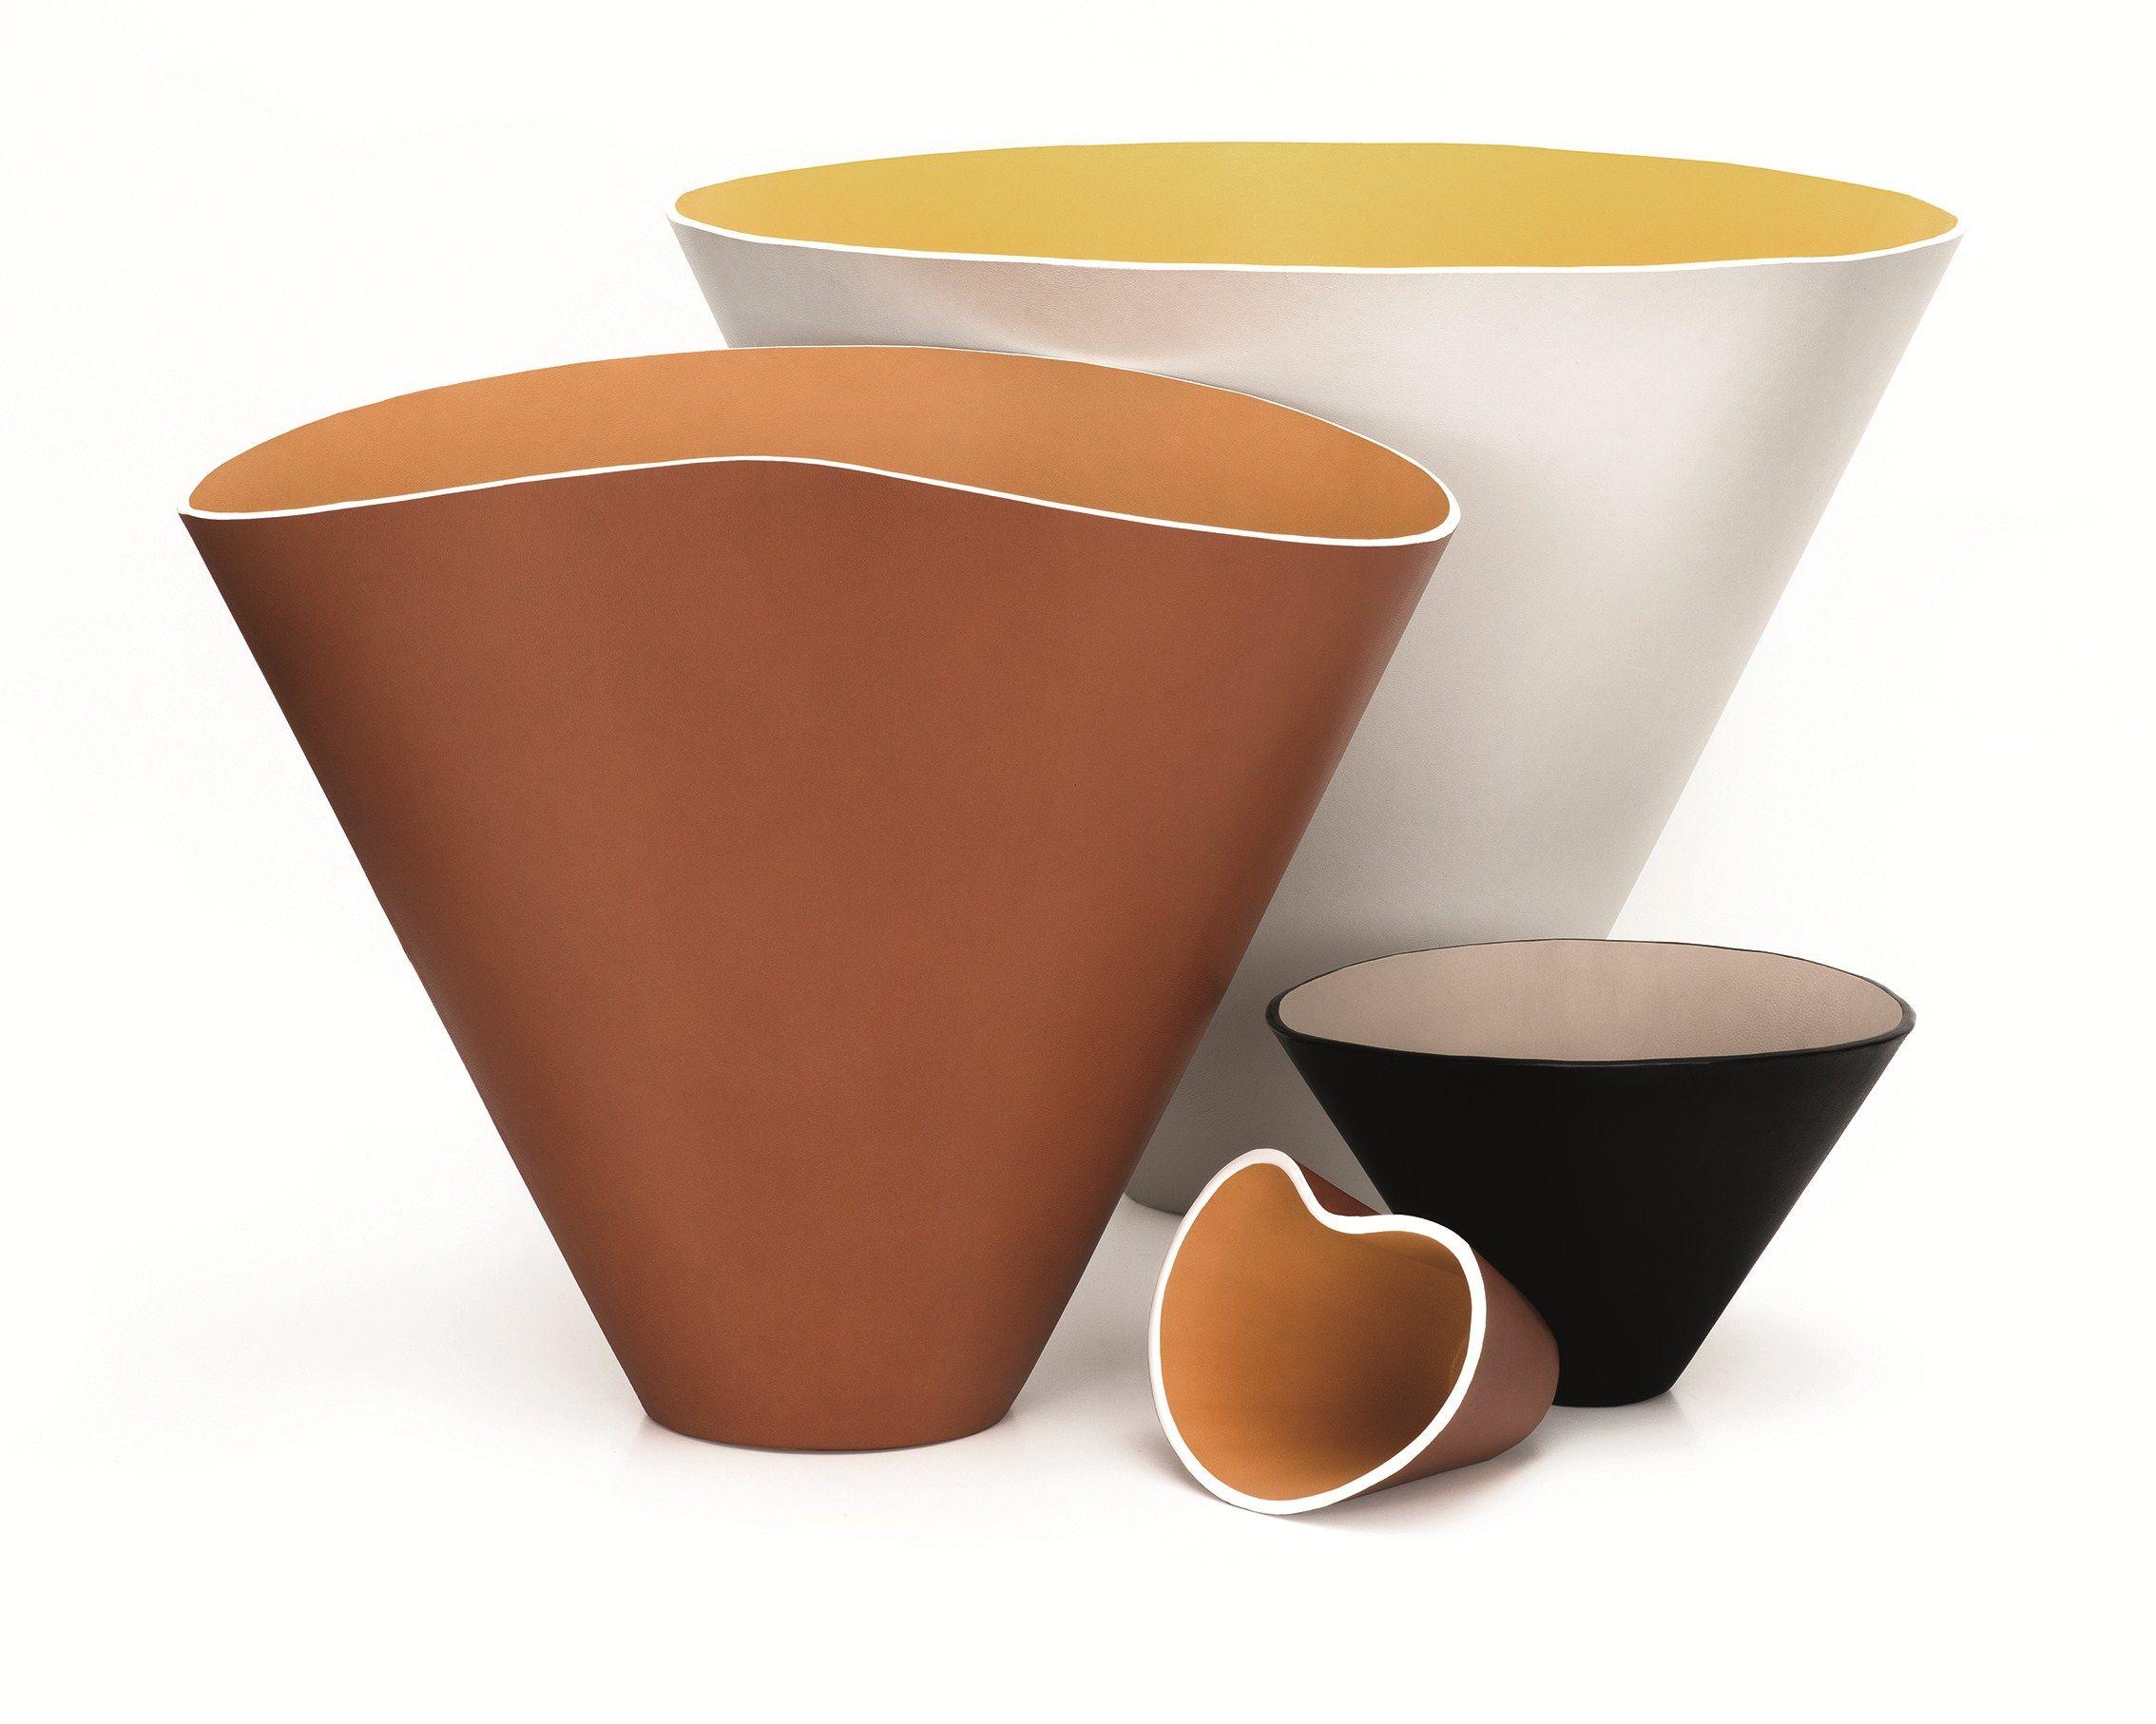 Loewe Bowls Project──探究獨特皮革美學 | mensuno.asia